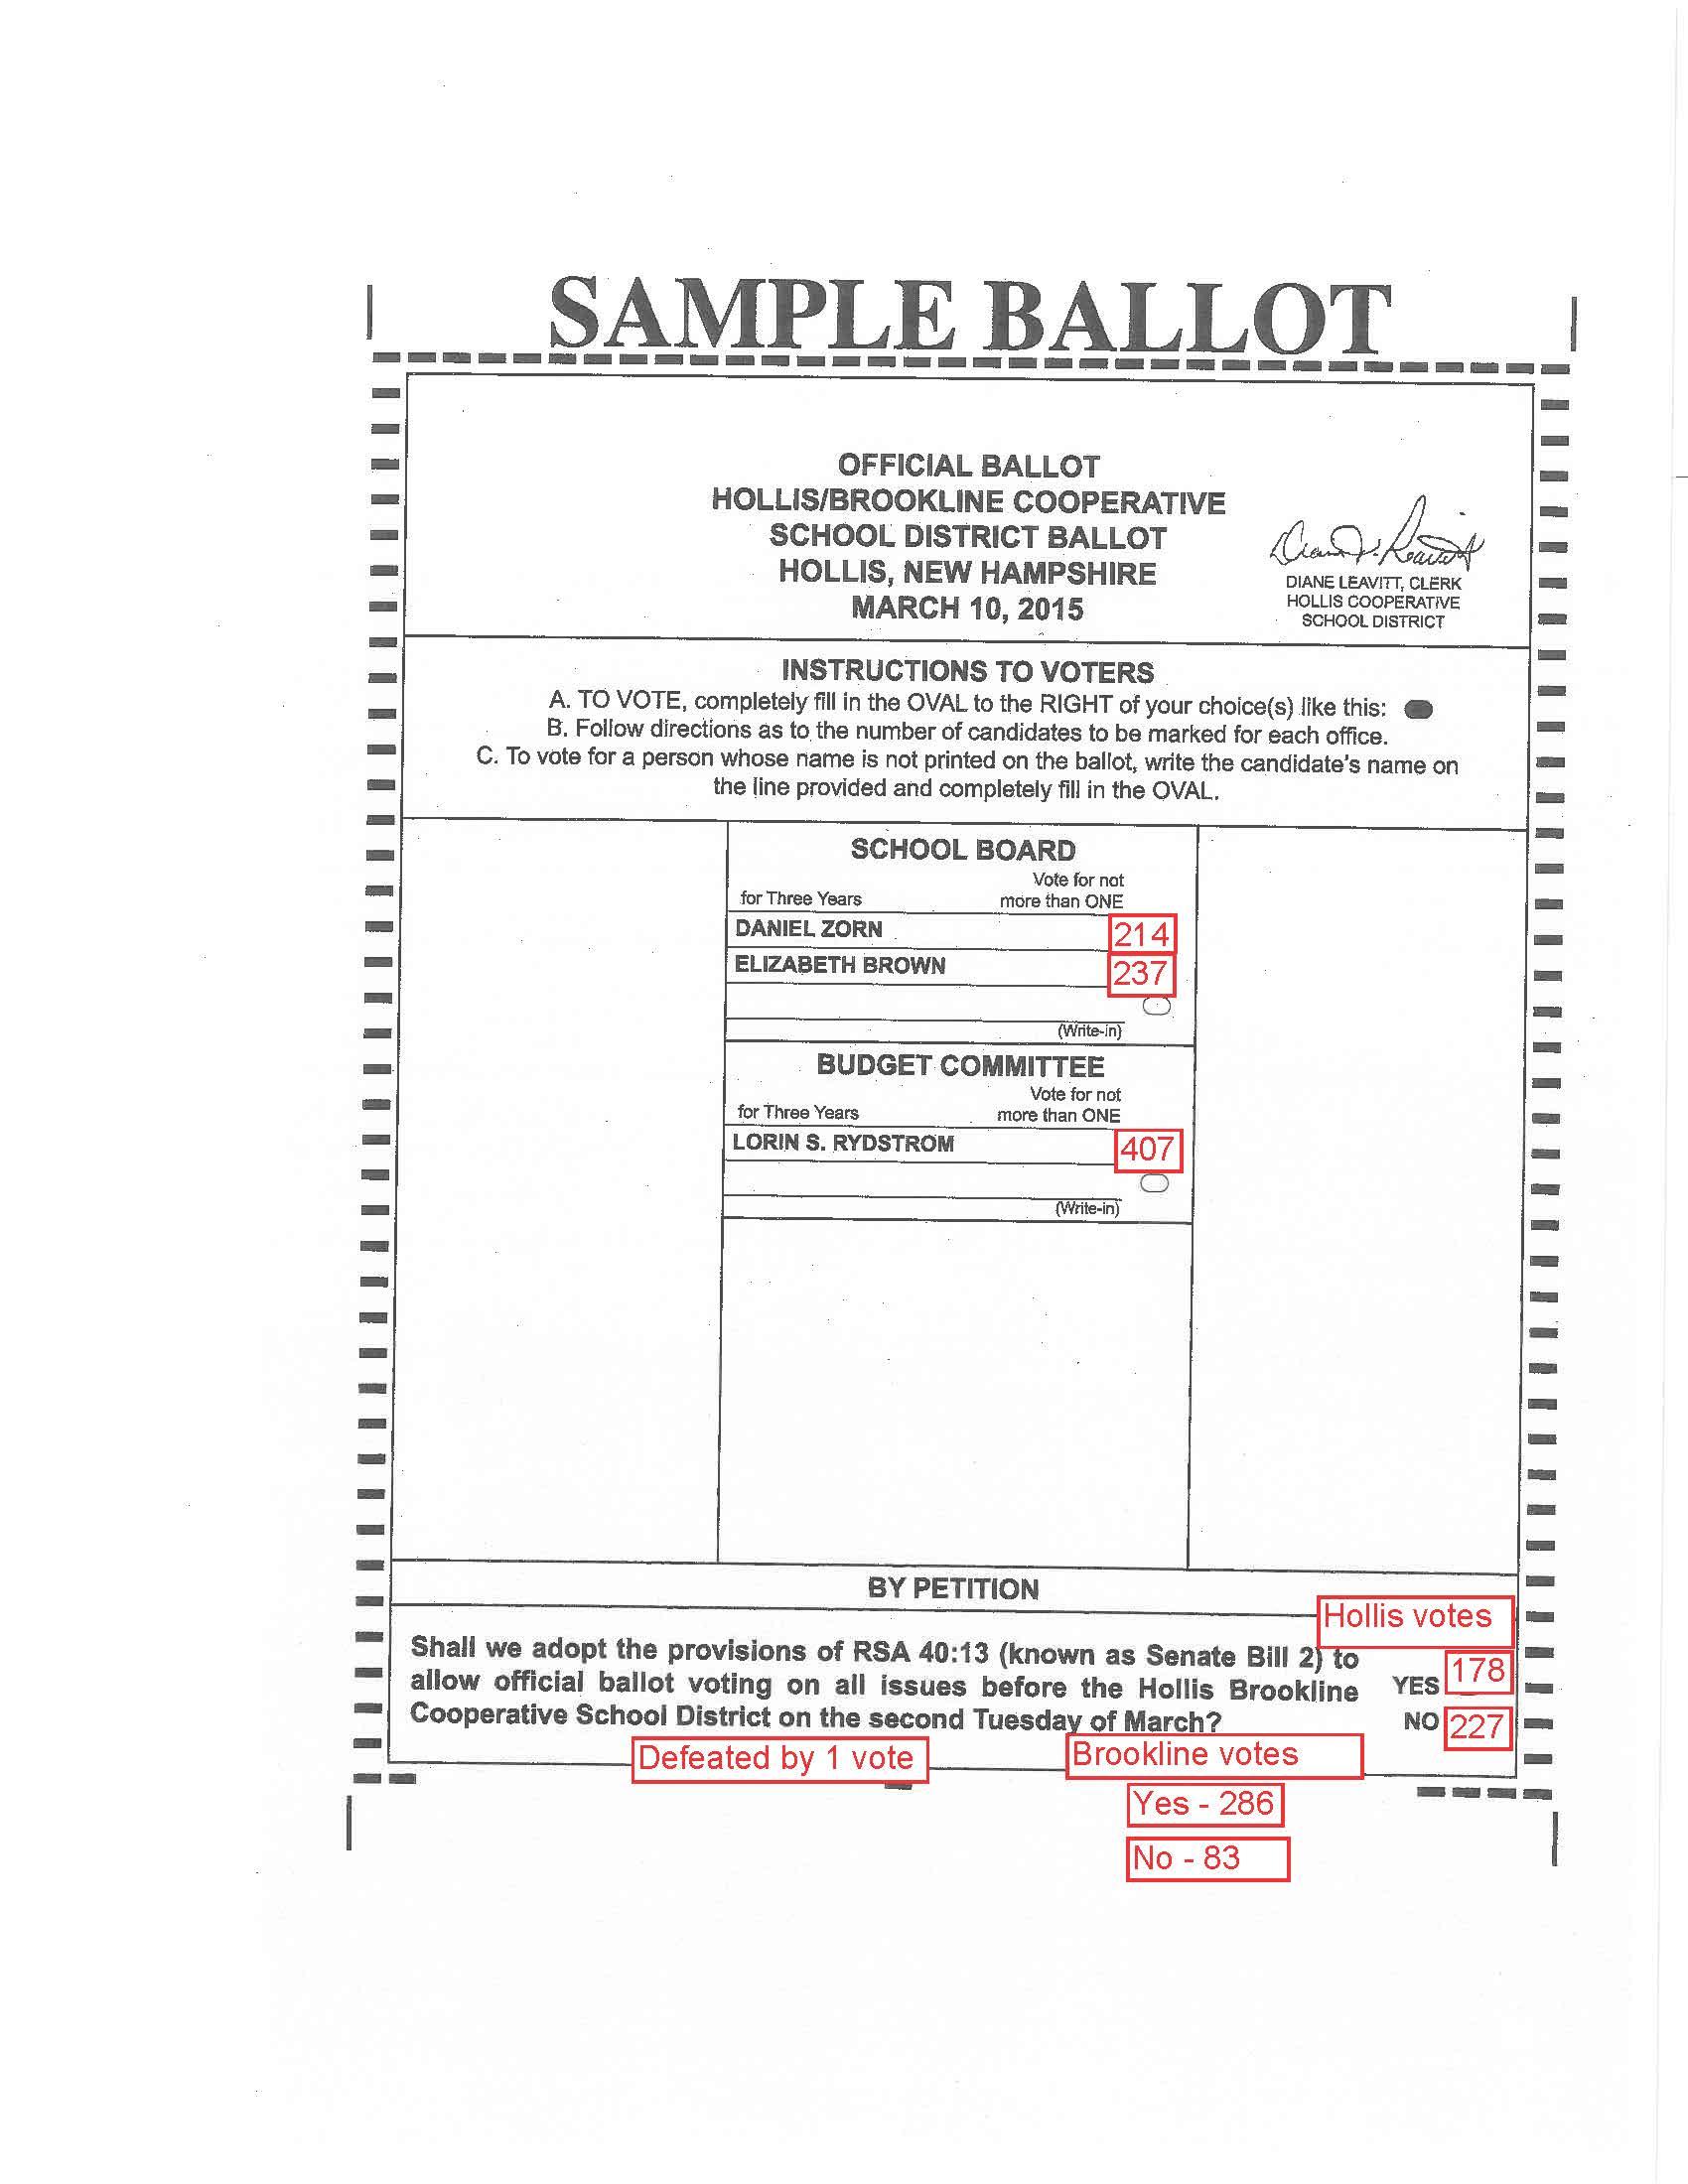 Londonderry absentee voting & sample ballots – londonderry news.